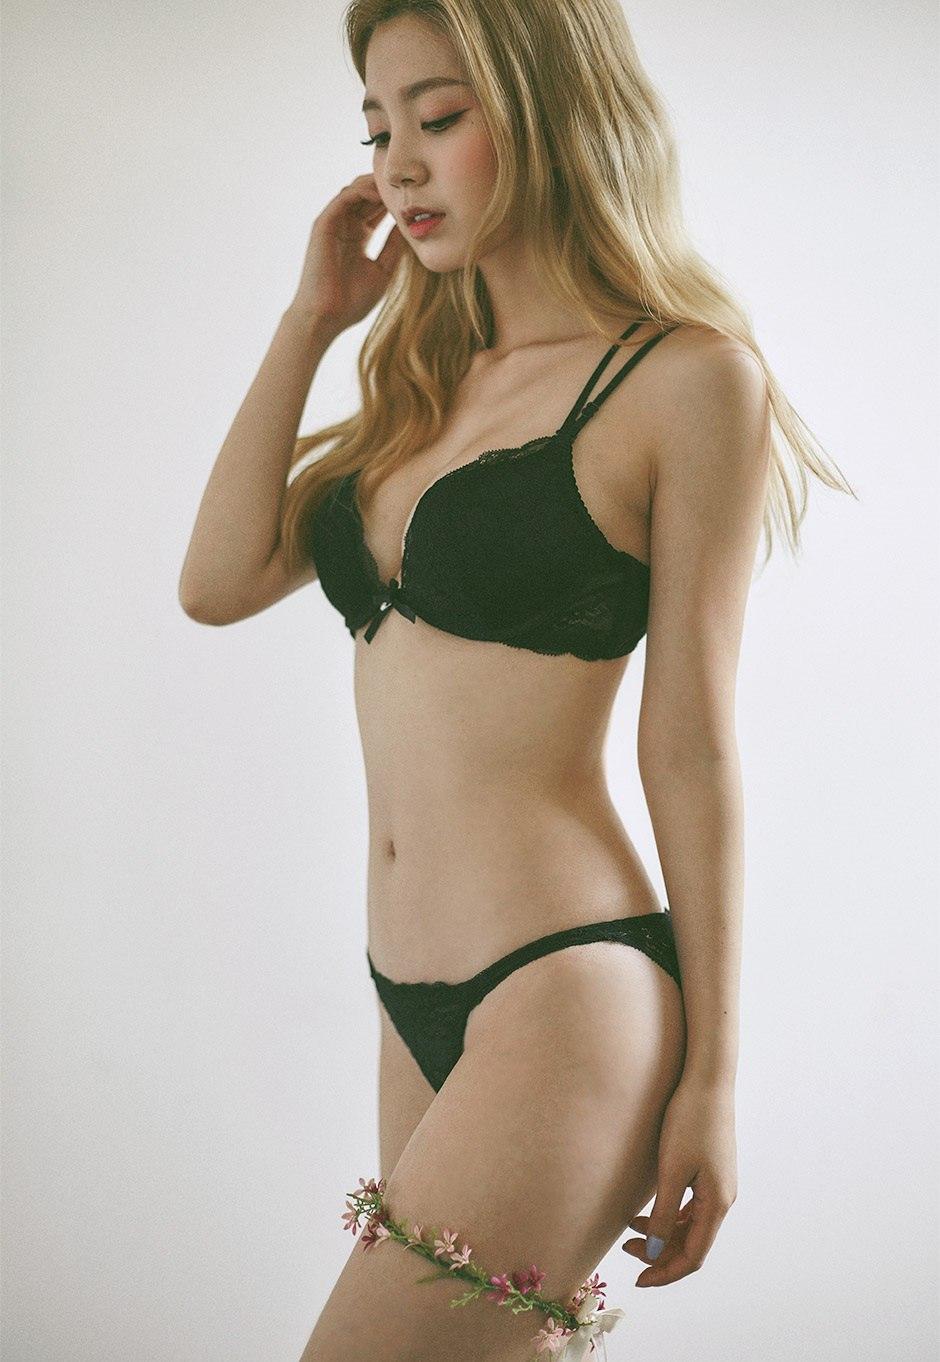 Asian Hot Model Post